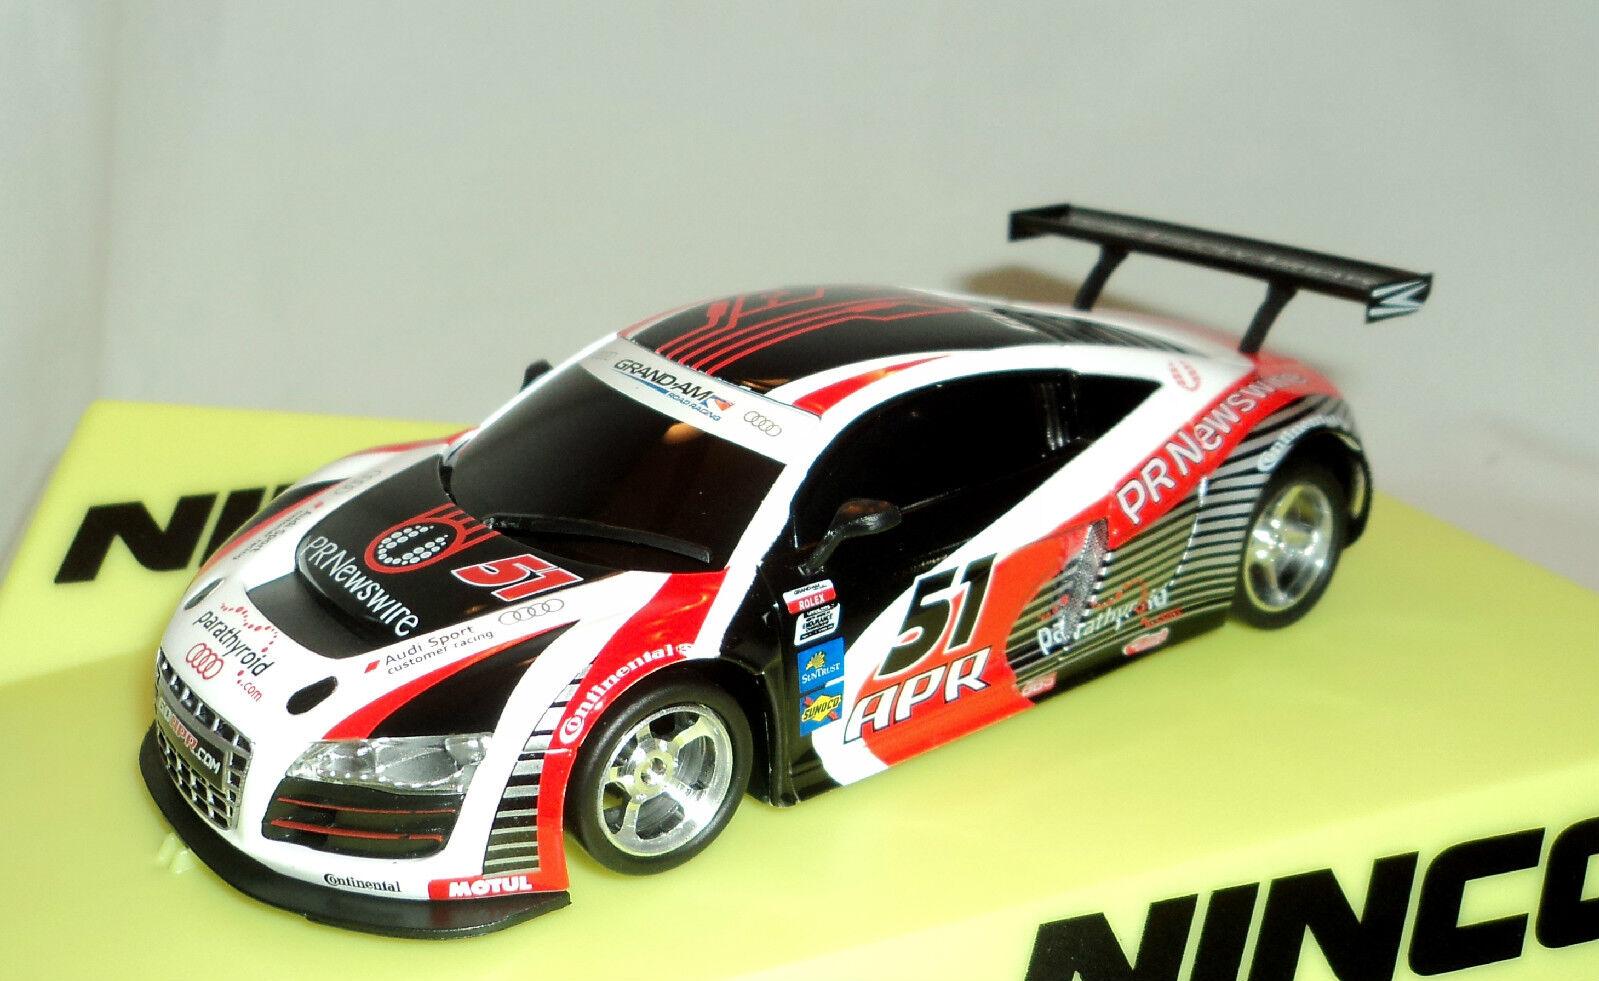 NINCO 50623 AUDI R8 GT3 Lightning NC-12 trituradora de nuevo 1 32 Slot Car